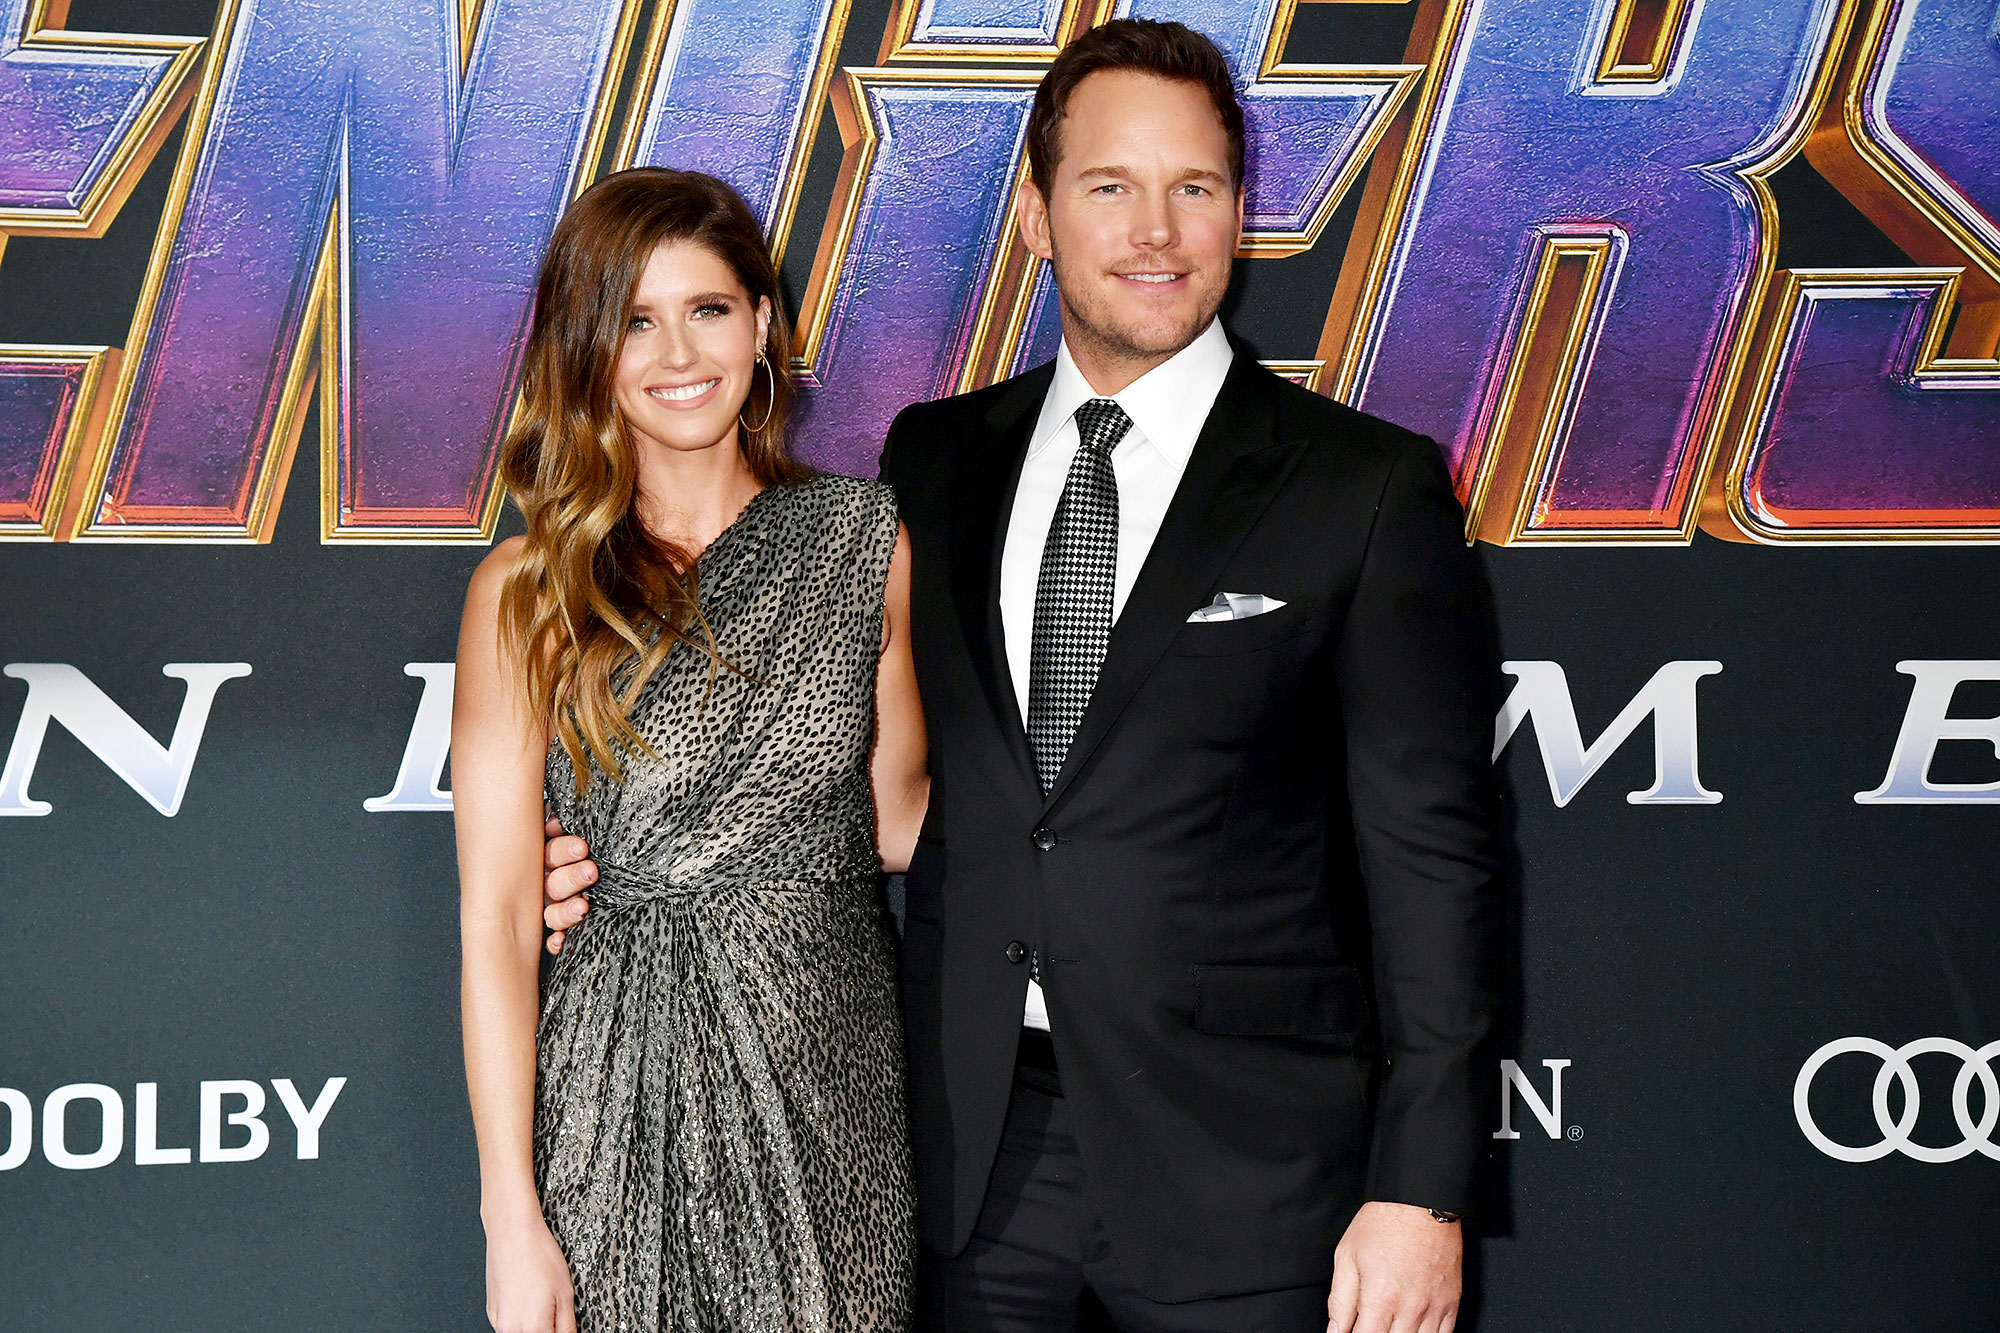 Katherine Schwarzenegger Chris Prat Ex Wife Anna Faris